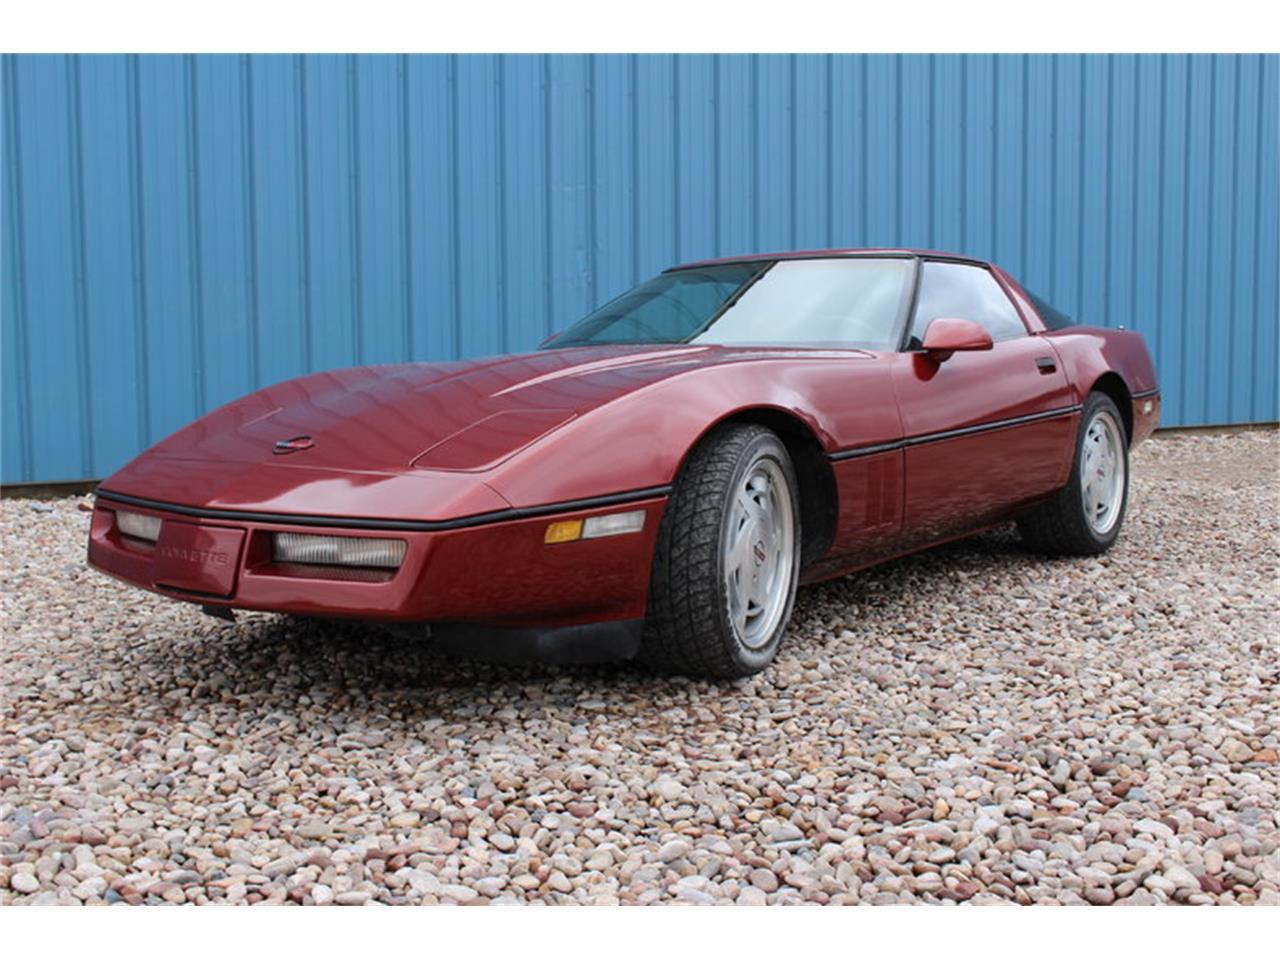 Large Picture of '86 Corvette located in Utah - $7,995.00 - J45B